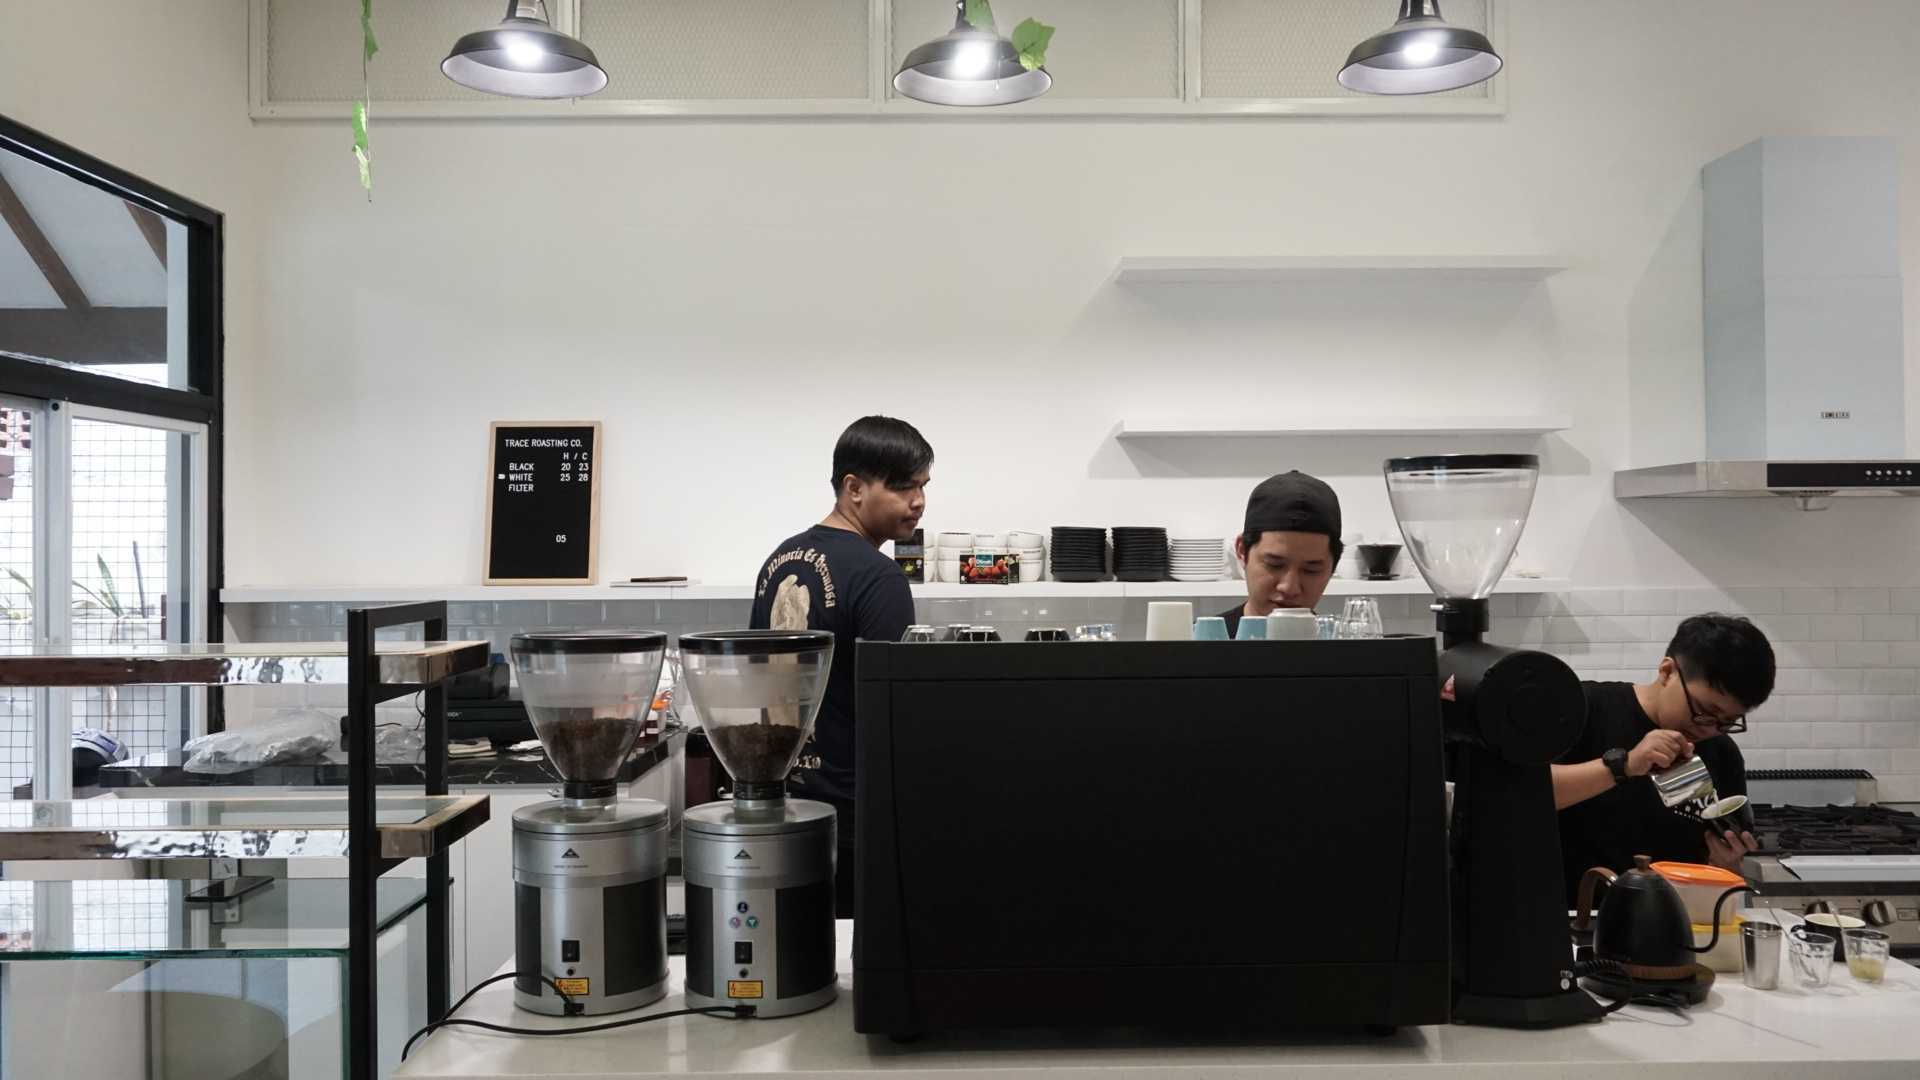 Jourell & Styles Cafe Setiabudi Jakarta, Daerah Khusus Ibukota Jakarta, Indonesia Jakarta, Daerah Khusus Ibukota Jakarta, Indonesia Jourell-Styles-Cafe-Setiabudi   134466